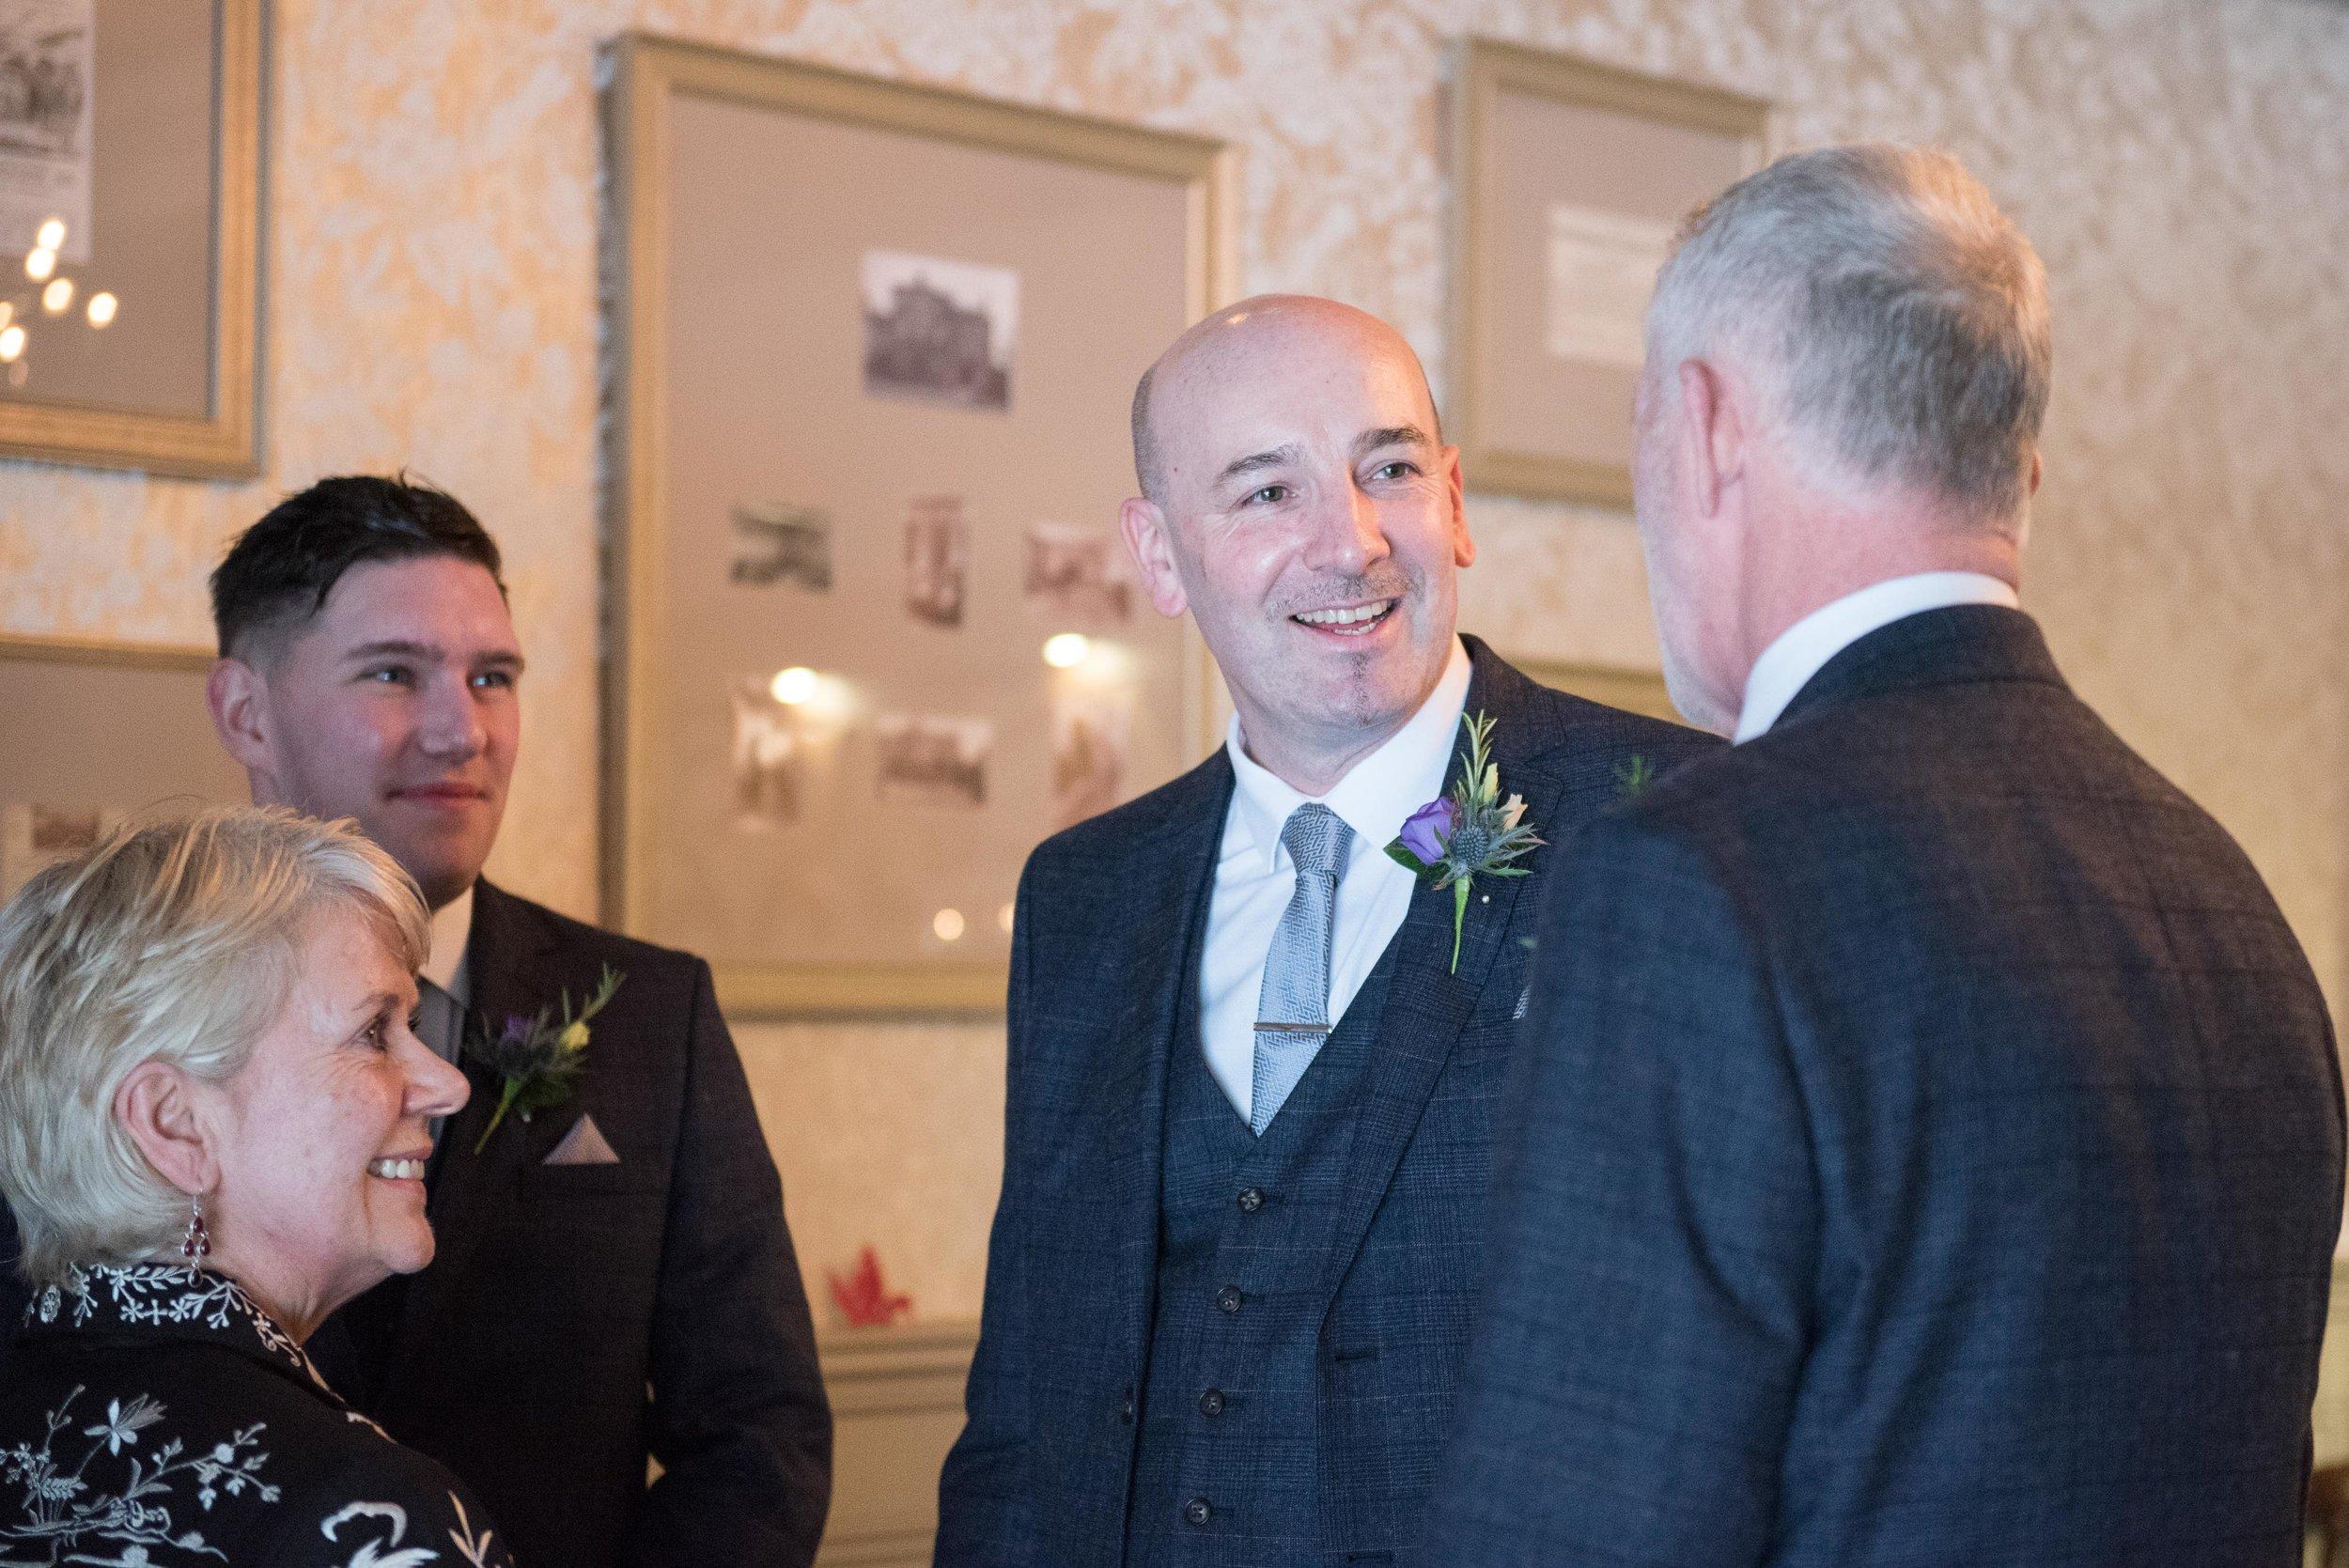 wedding guests at grassington house